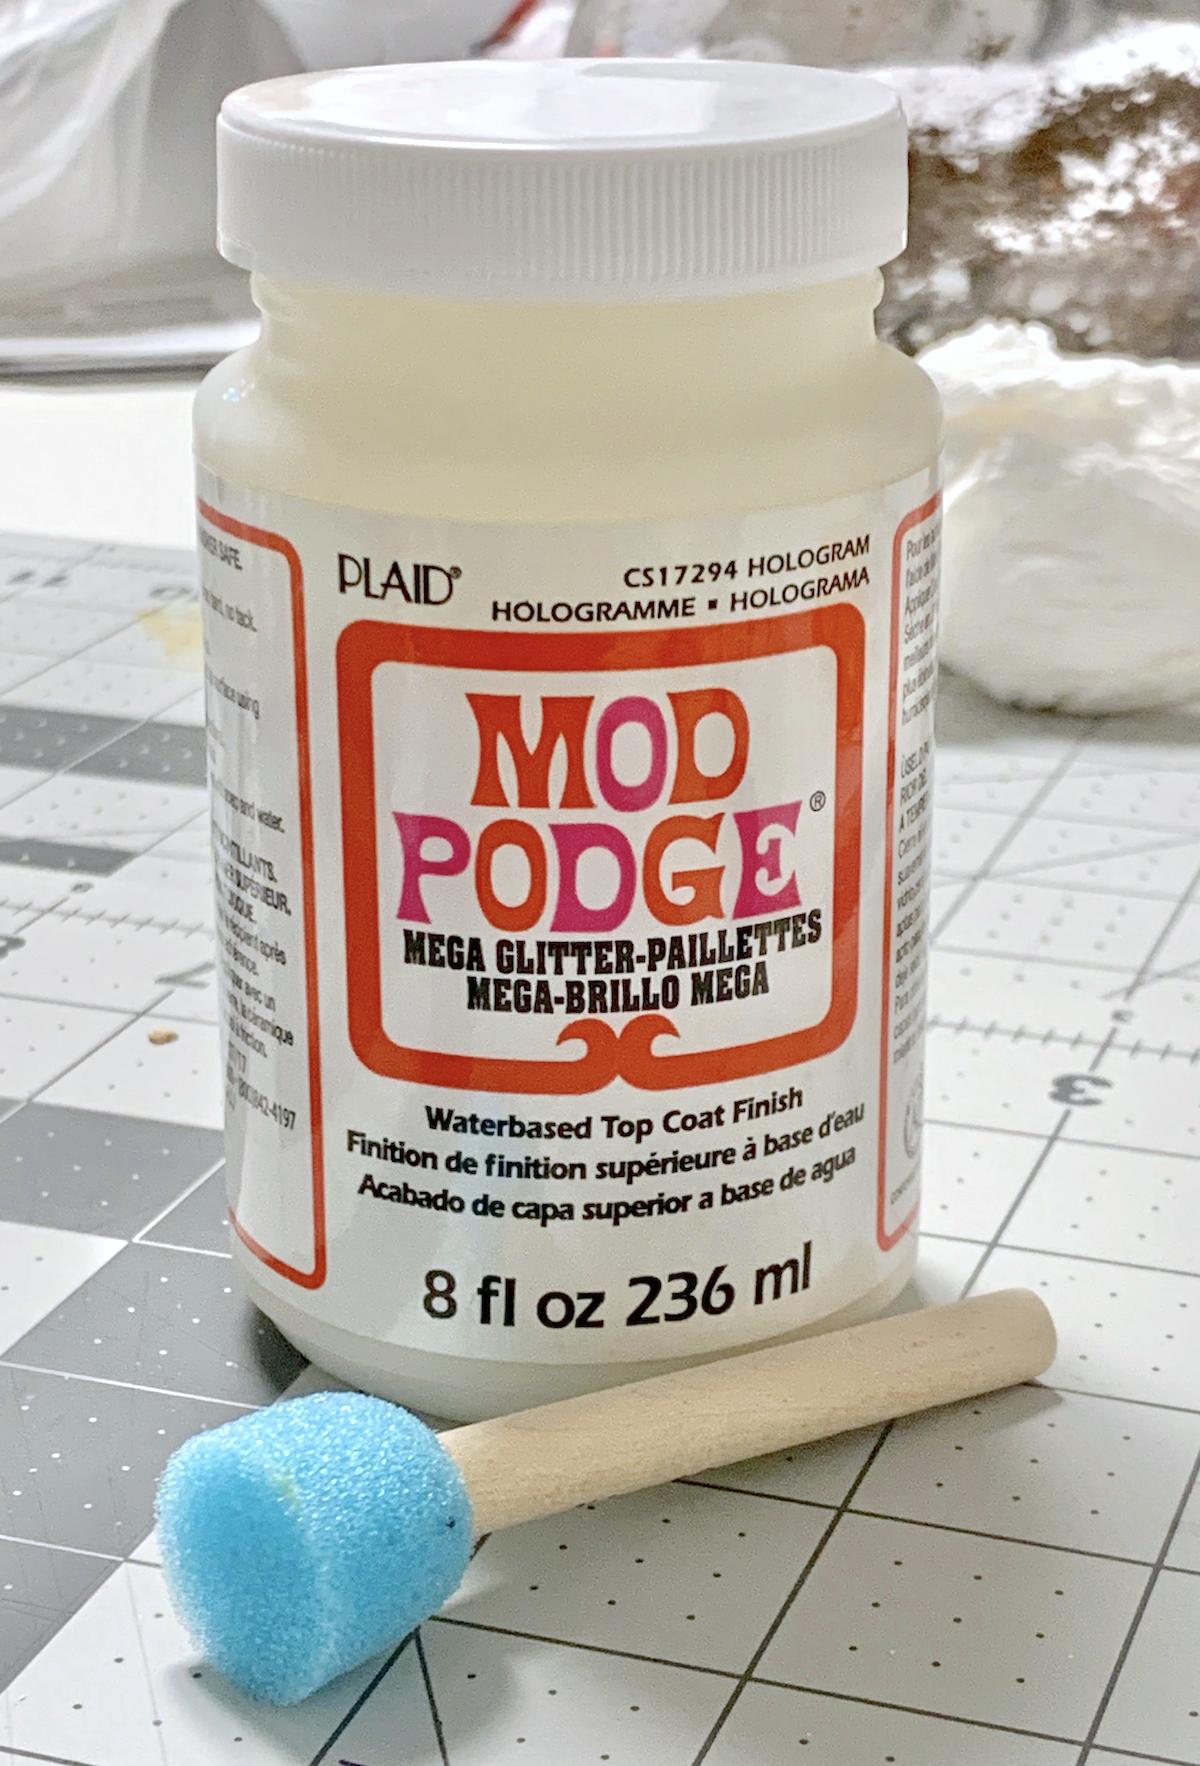 A bottle of Mega Glitter Mod Podge with a spouncer